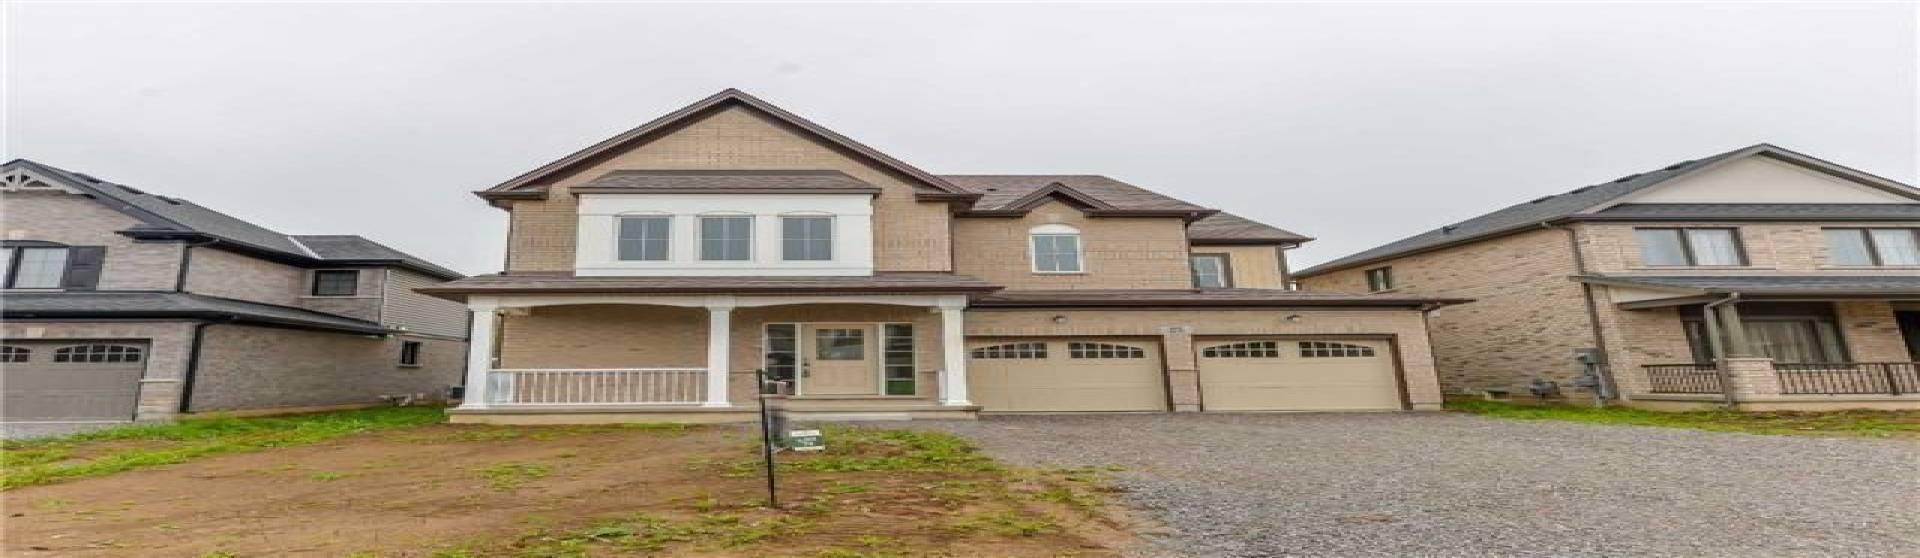 25 Crow St- Welland- Ontario L3C 0E4, 4 Bedrooms Bedrooms, 9 Rooms Rooms,3 BathroomsBathrooms,Detached,Sale,Crow,X4809152